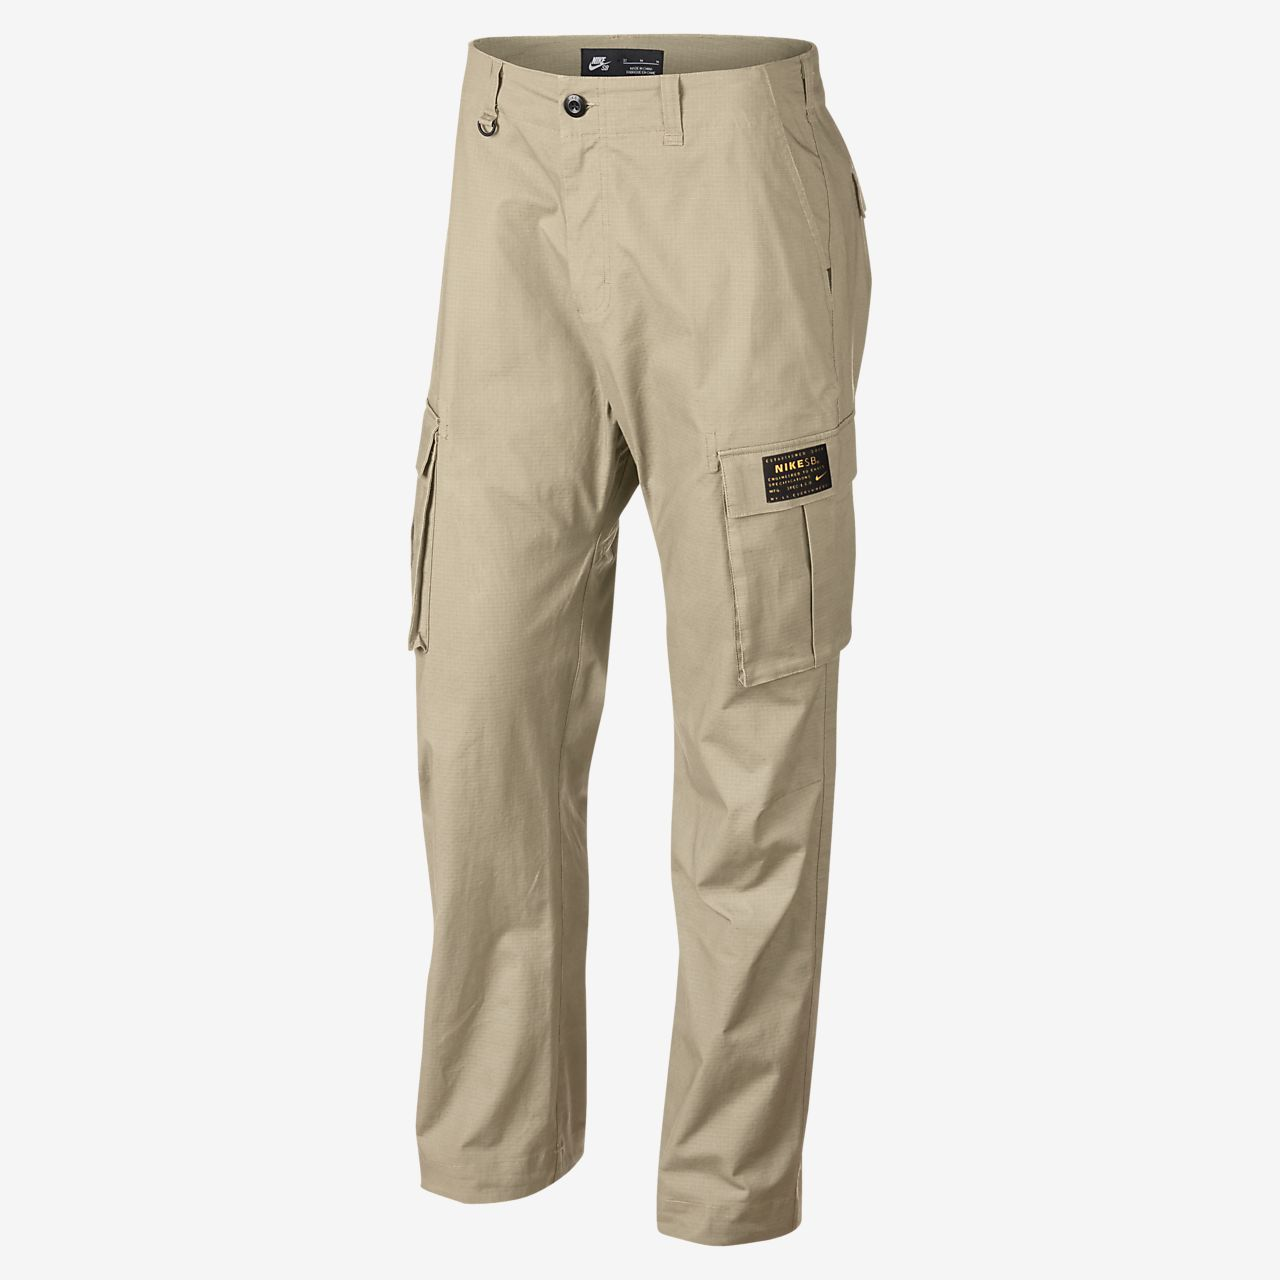 Pantaloni cargo da skate Nike SB Flex FTM - Uomo